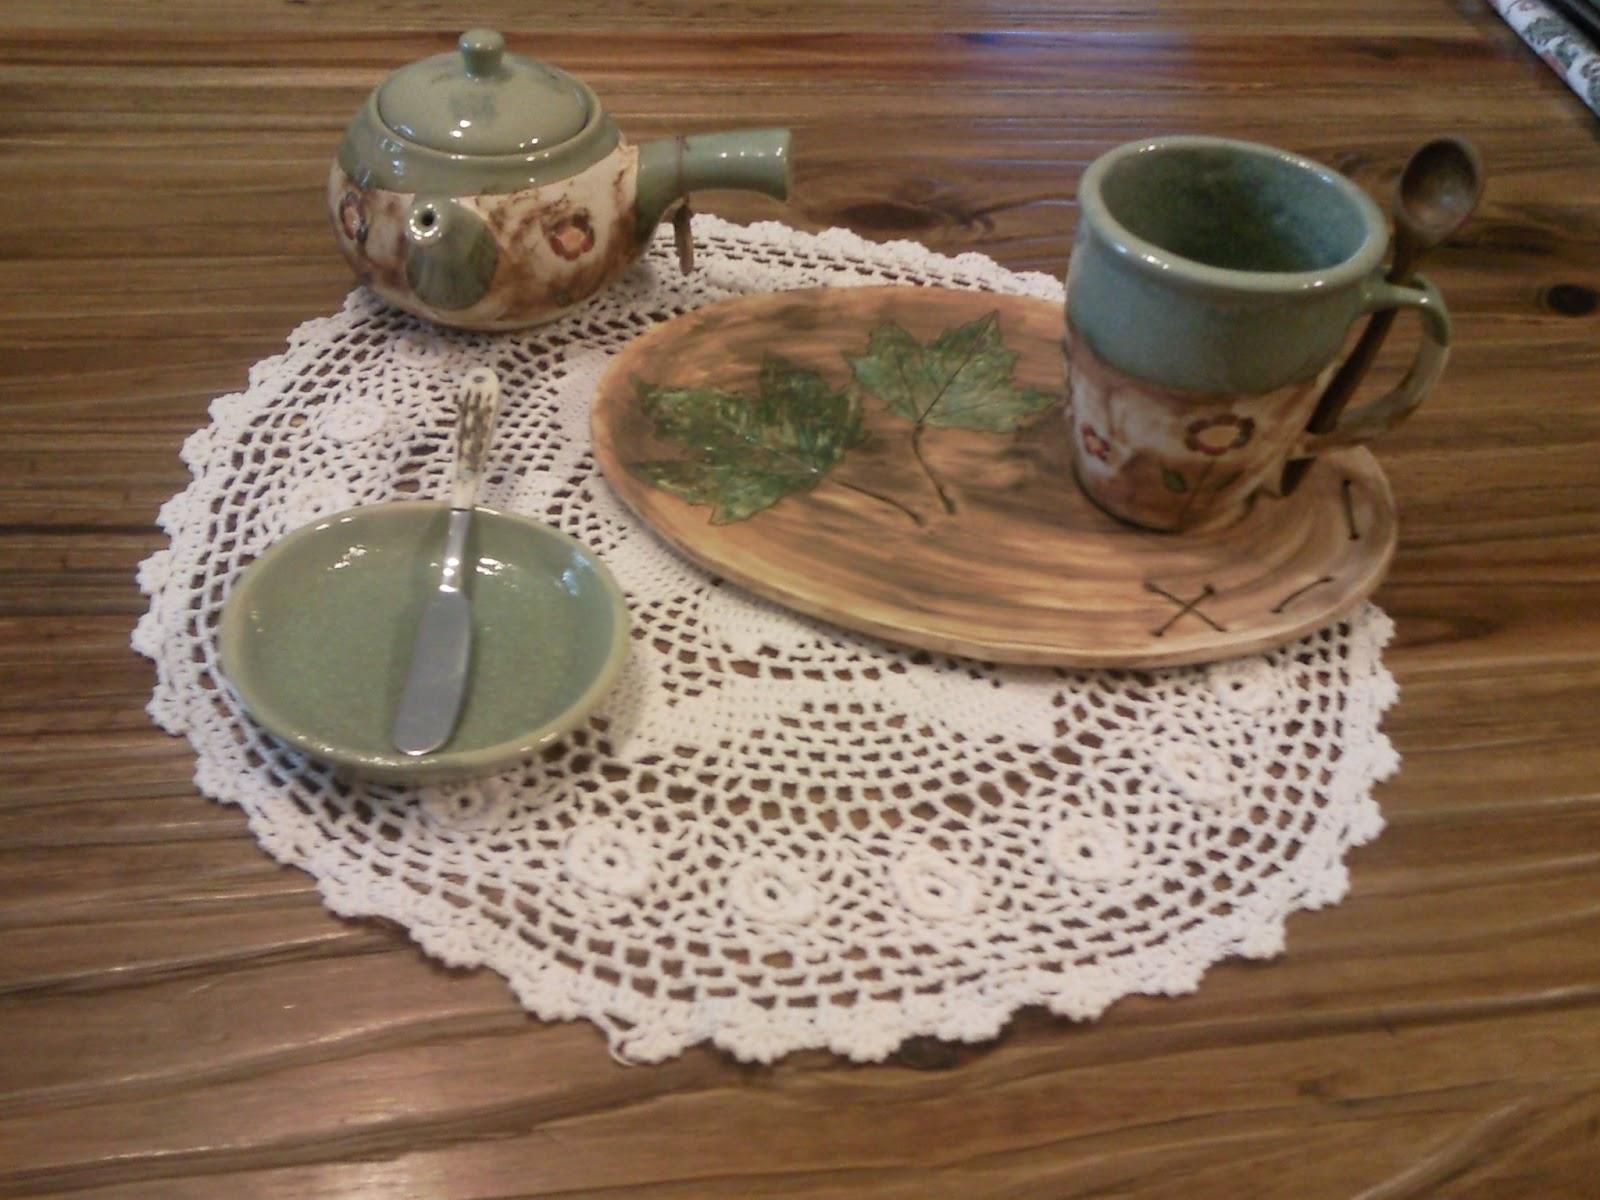 Ceramica artesanal rustica